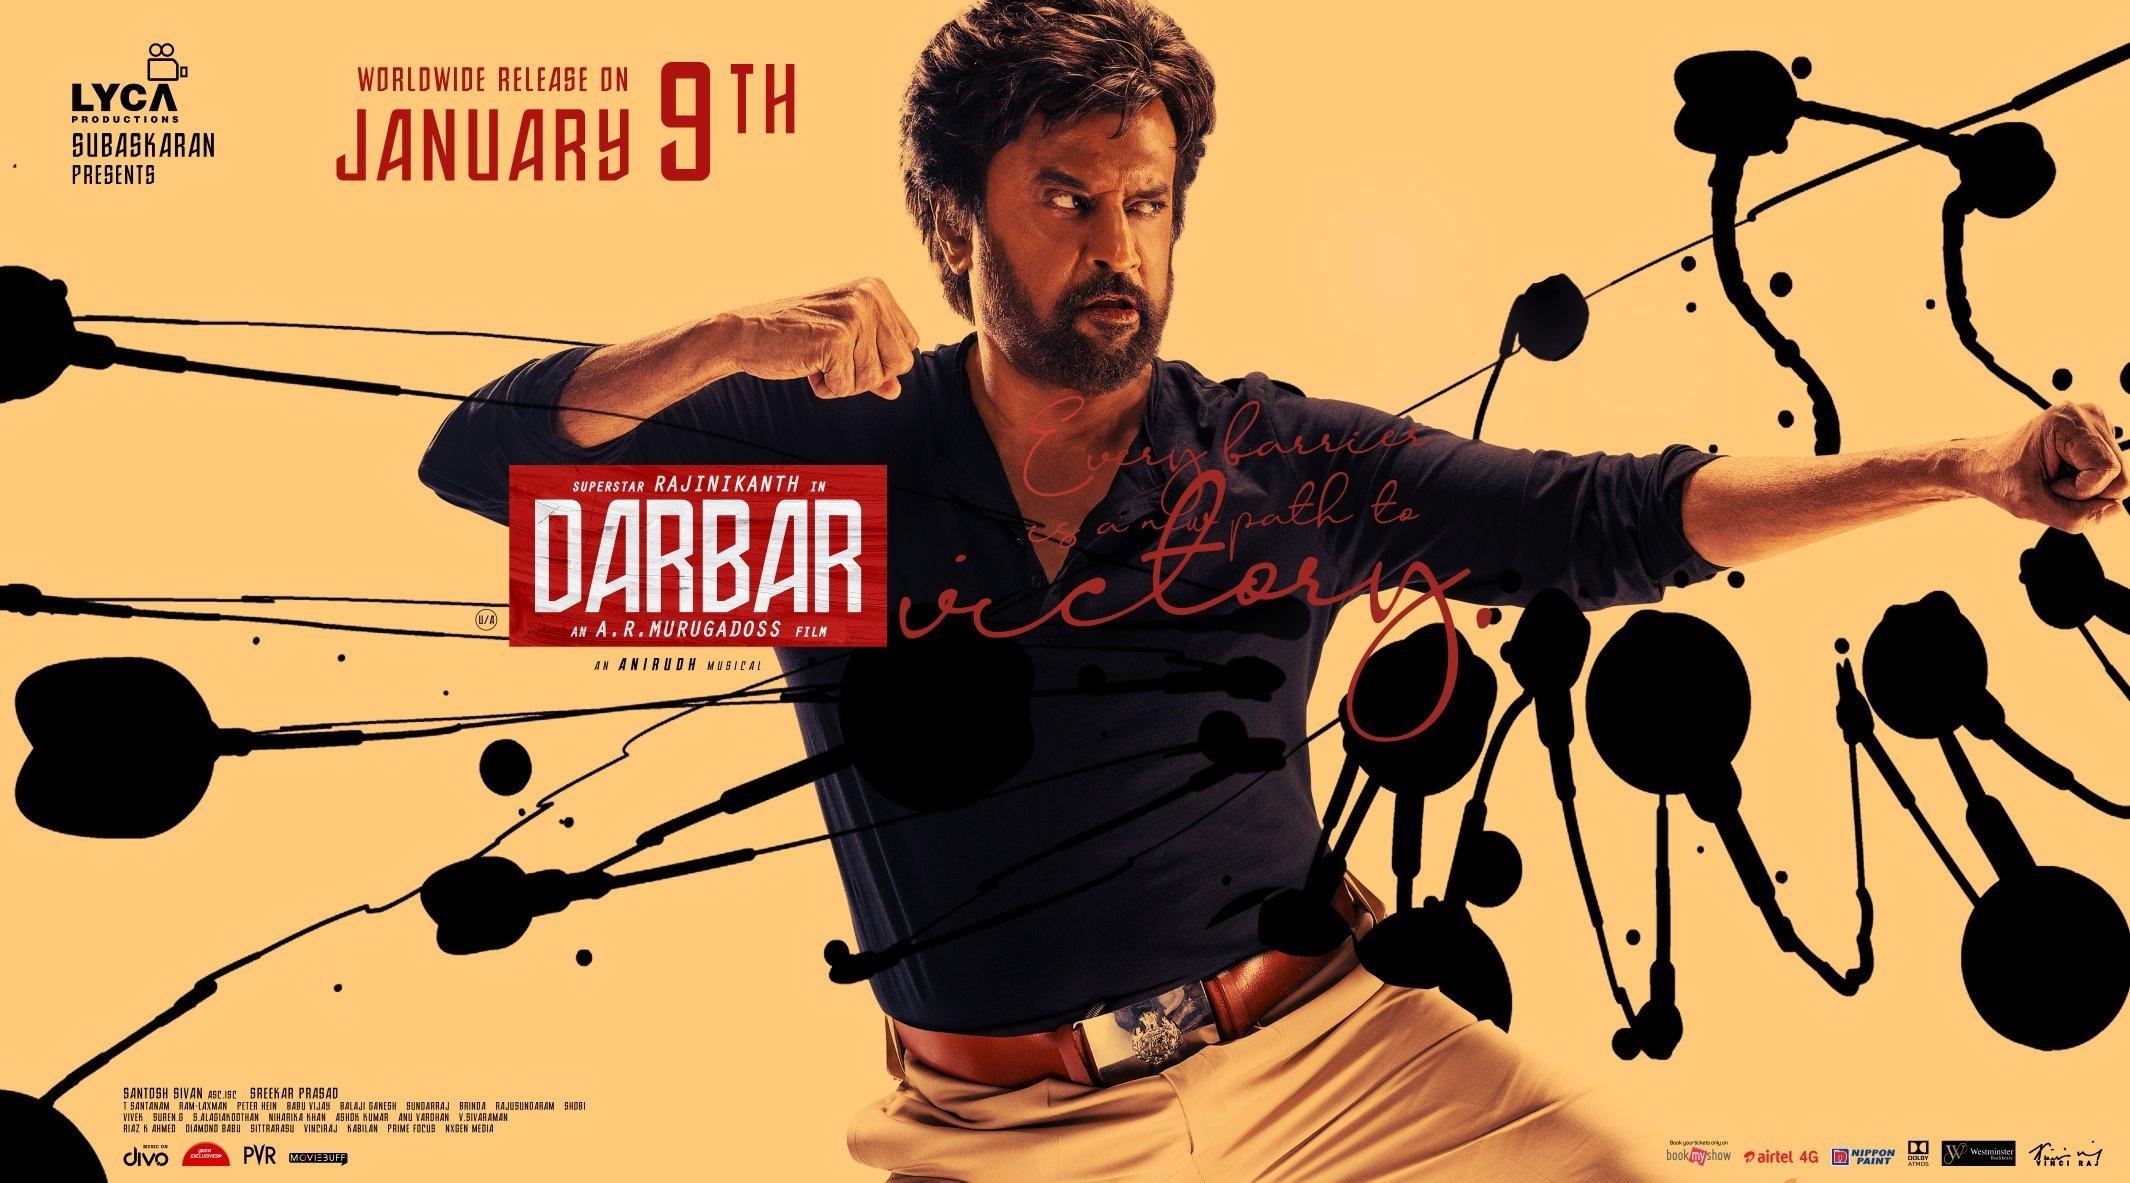 Darbar HD Poster